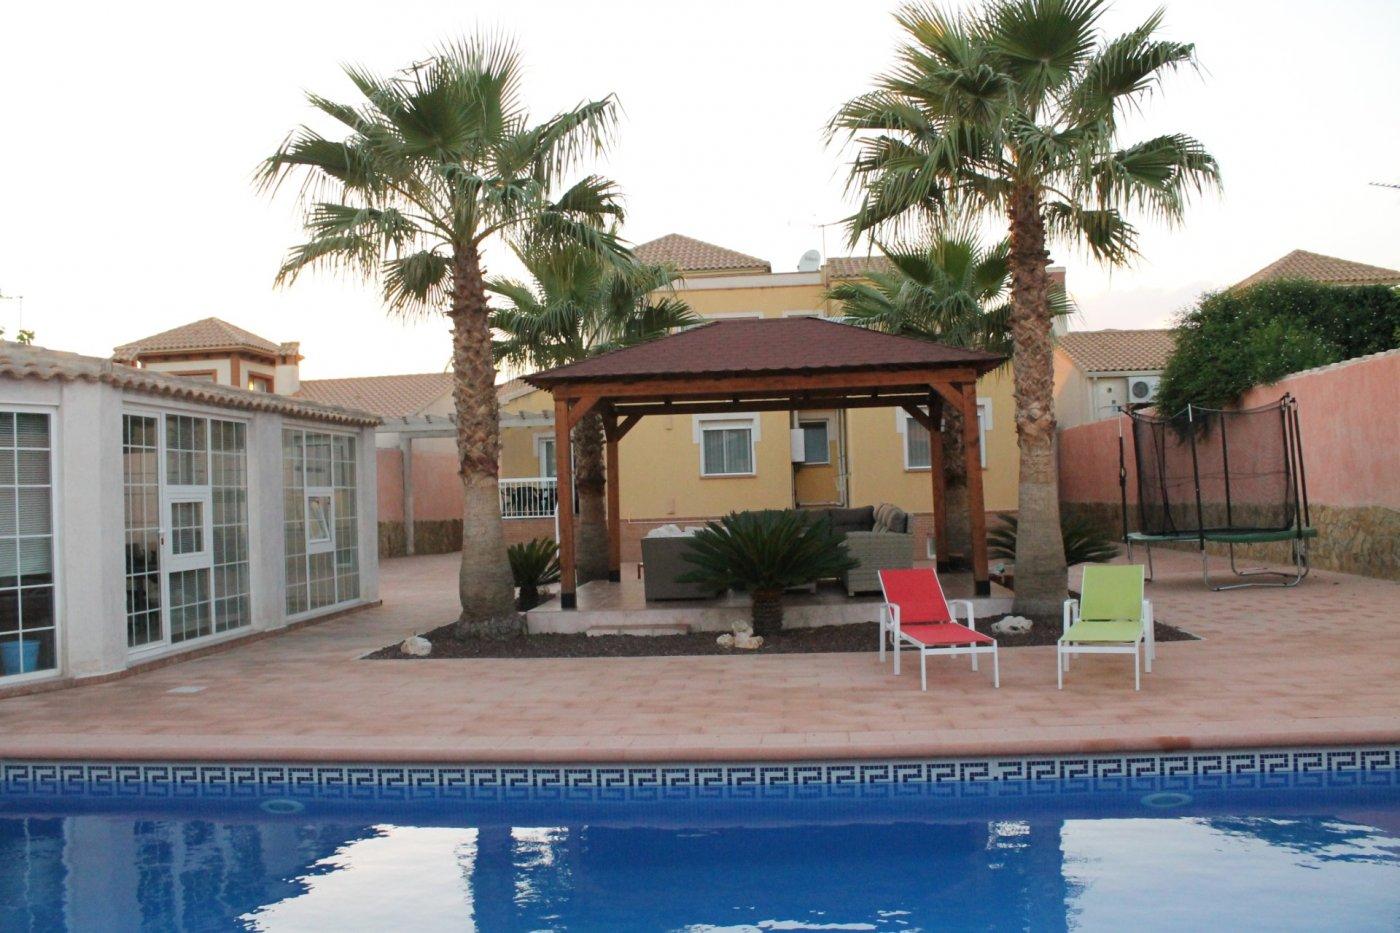 Chalet ref 3536 para sale en Churra España - Quality Homes Costa Cálida